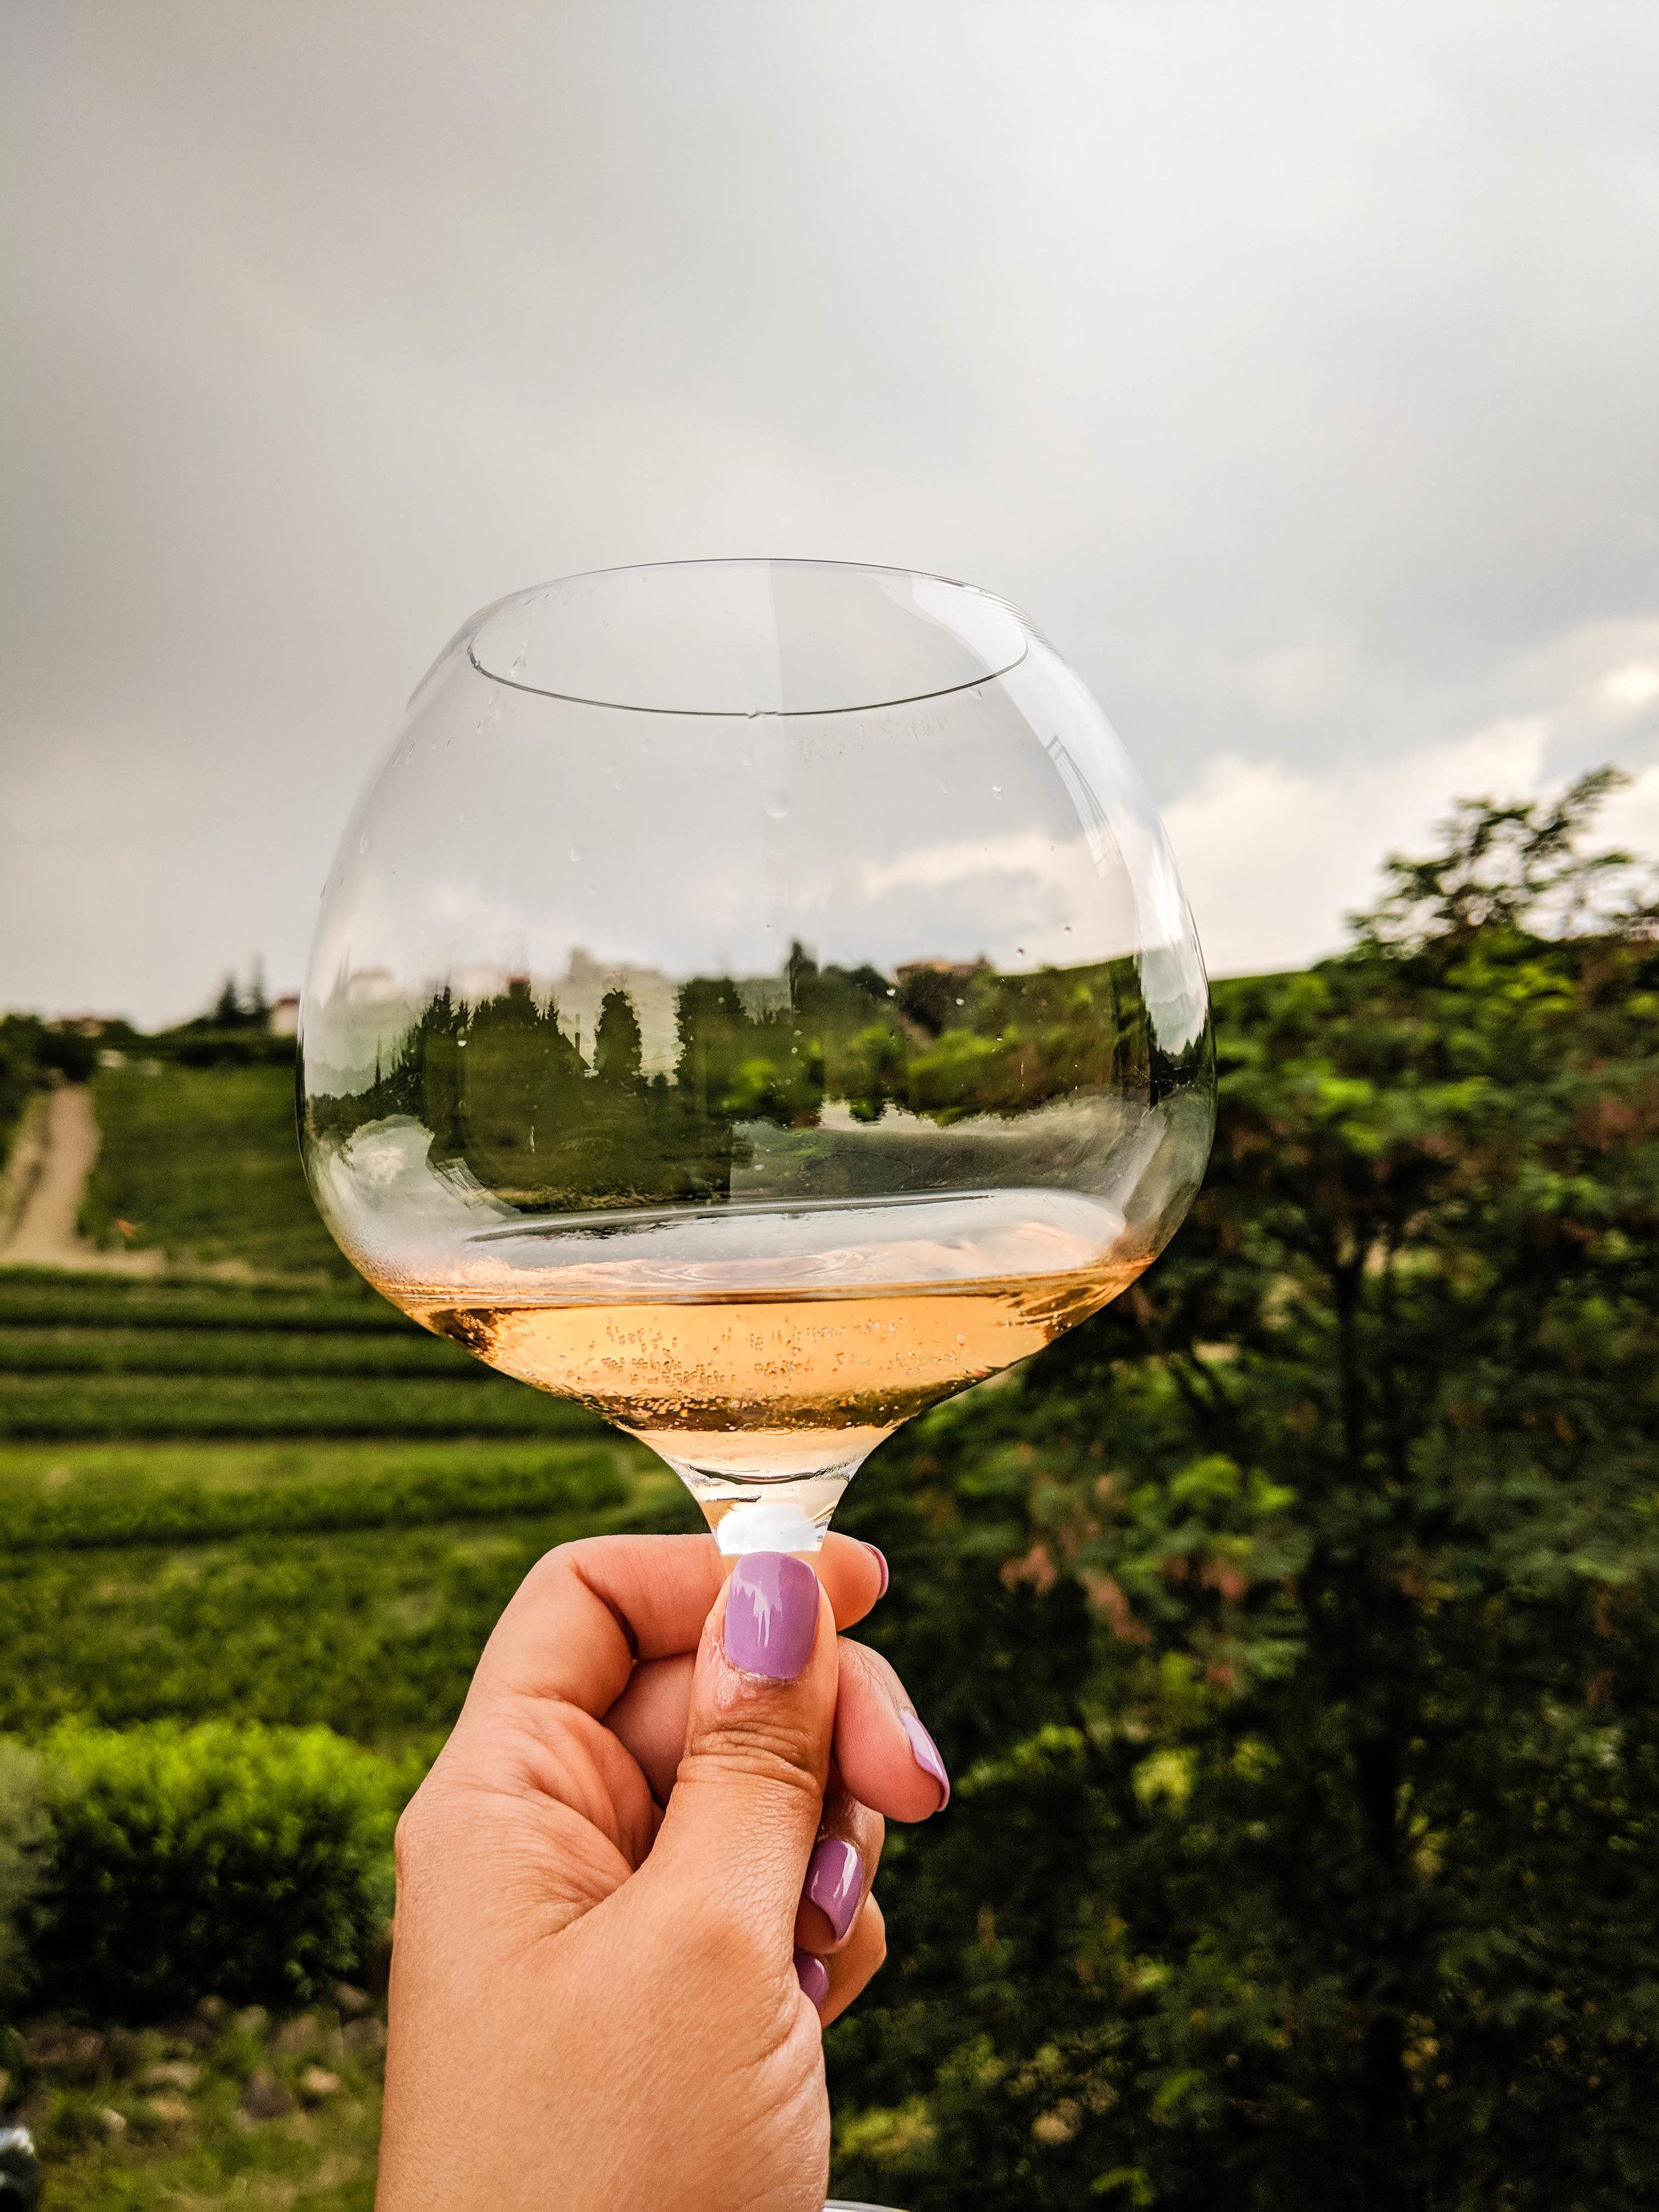 Orange wine of Kabaj Winery, located in Brda, Slovenia wine region